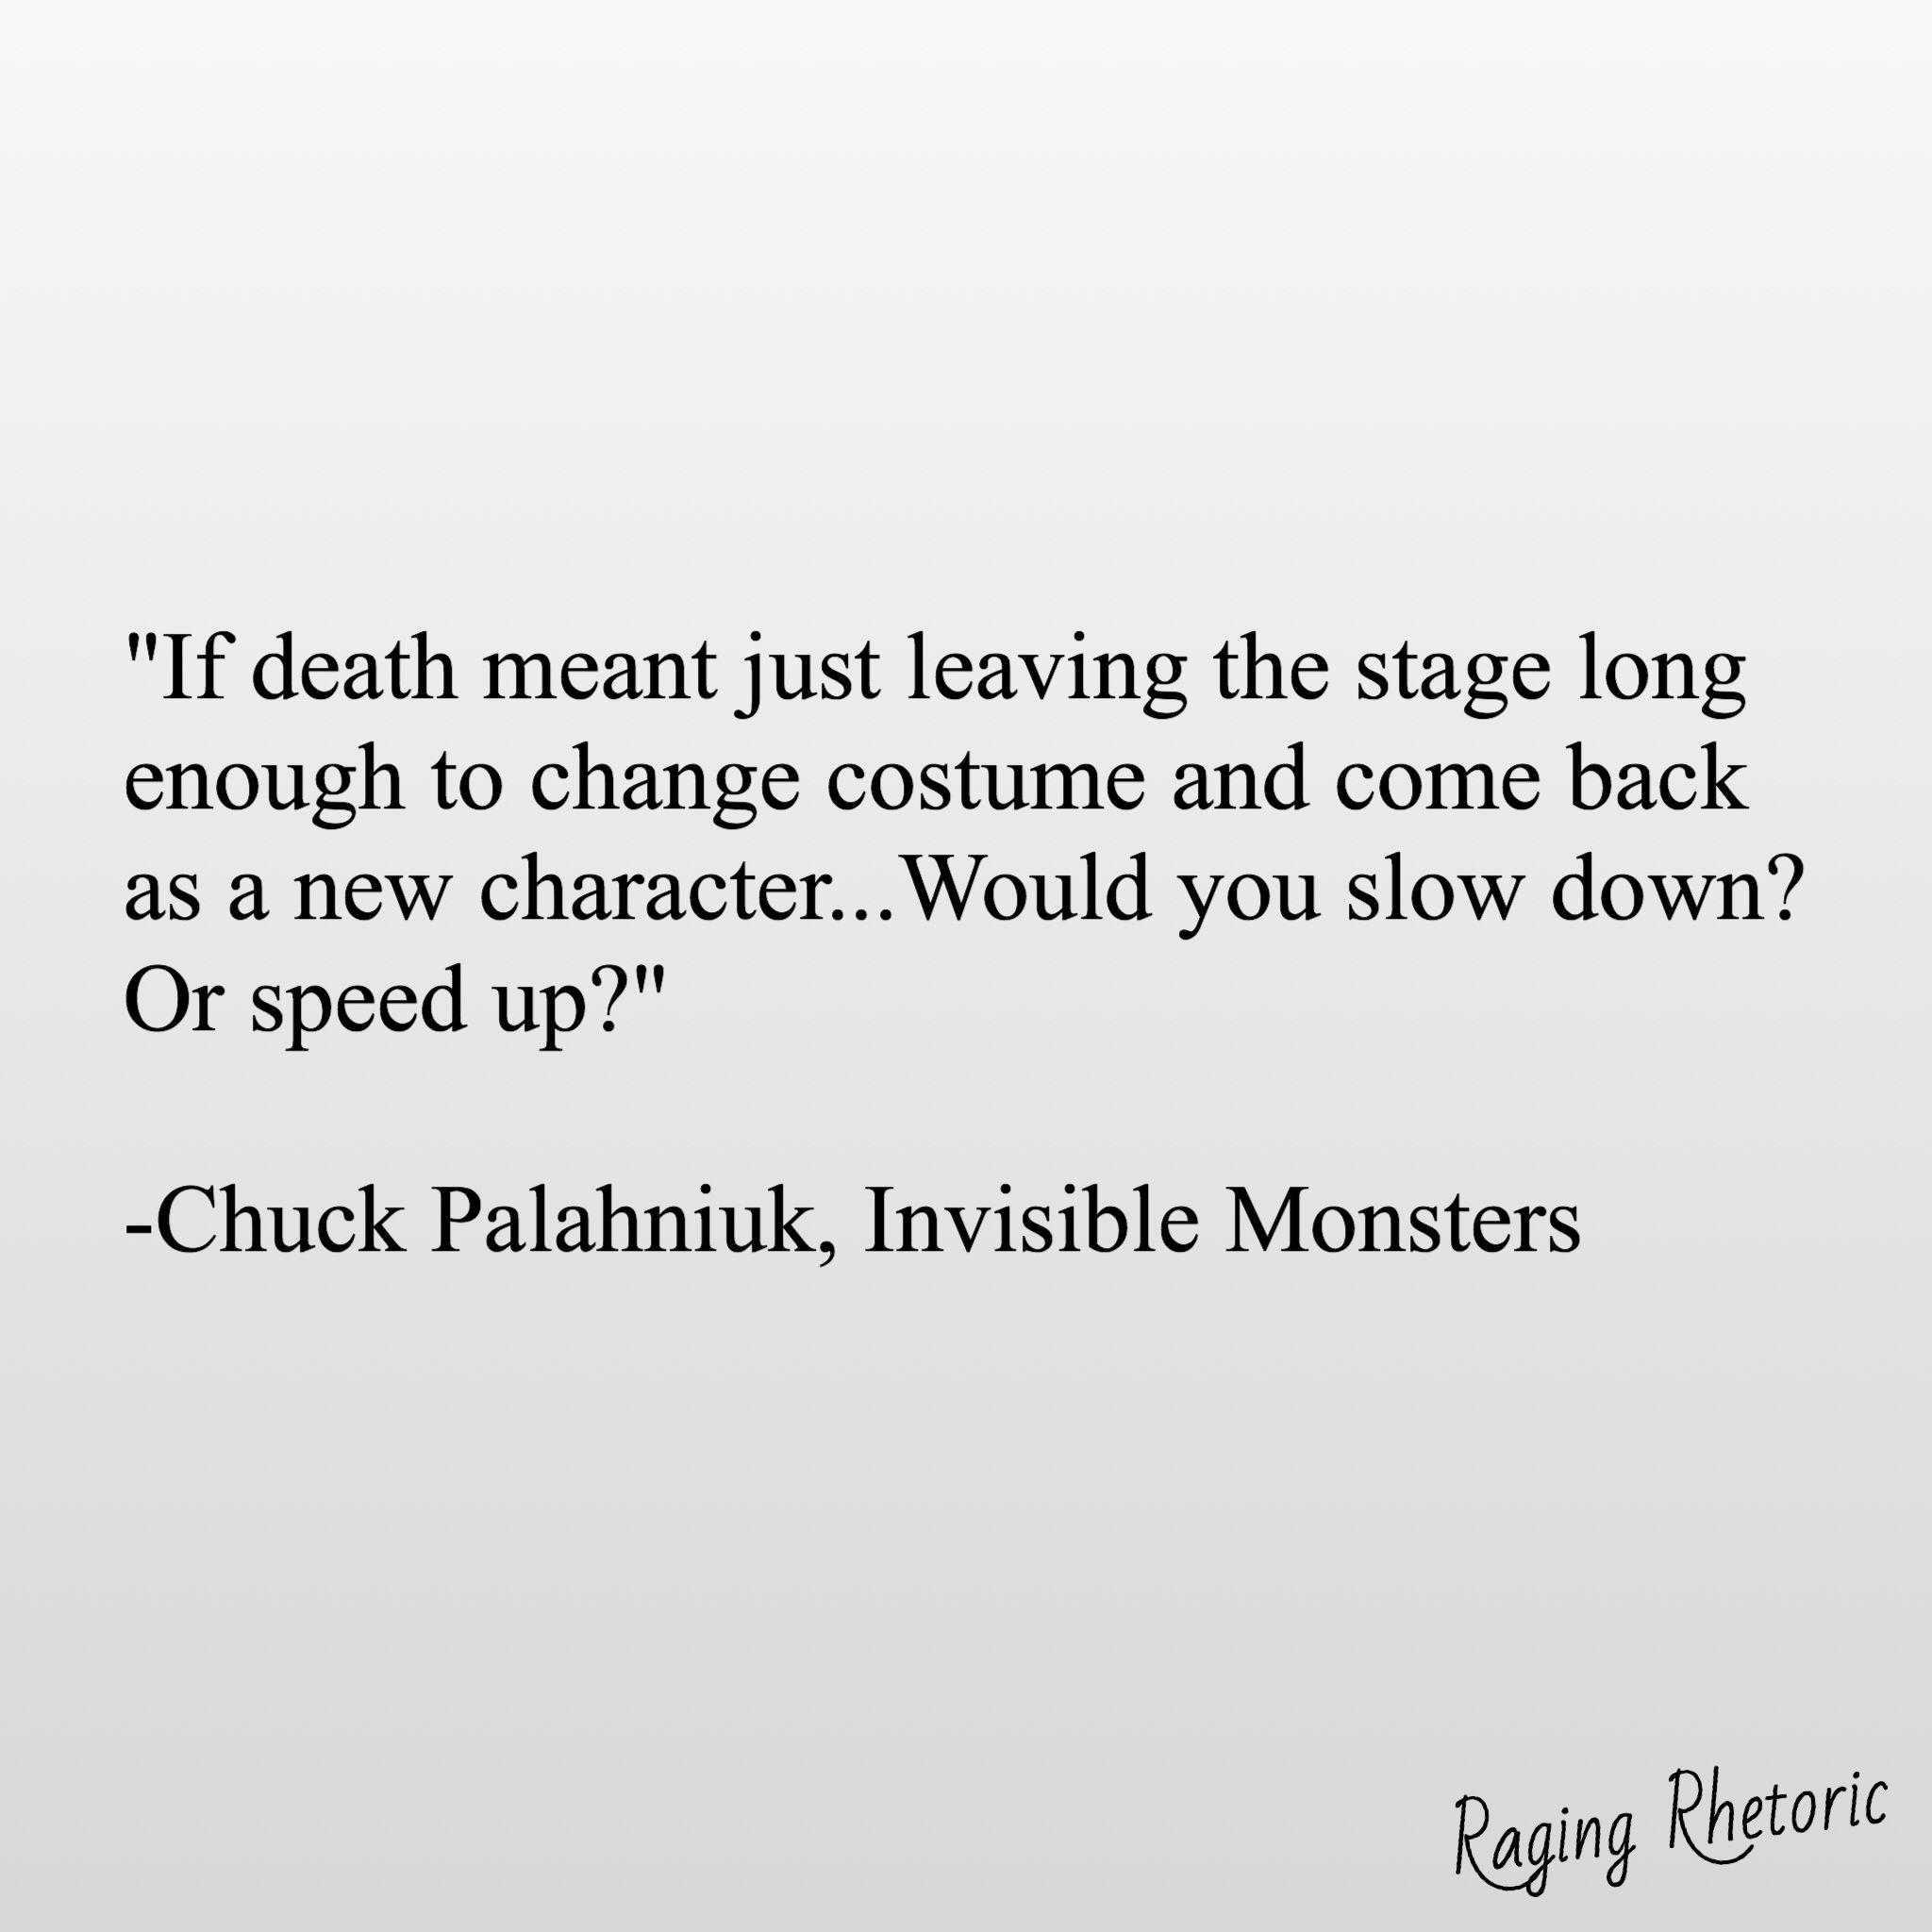 Pin By Raging Rhetoric On Chuck Palahniuk Life Quotes Chuck Palahniuk Writing Speed writing changing it up